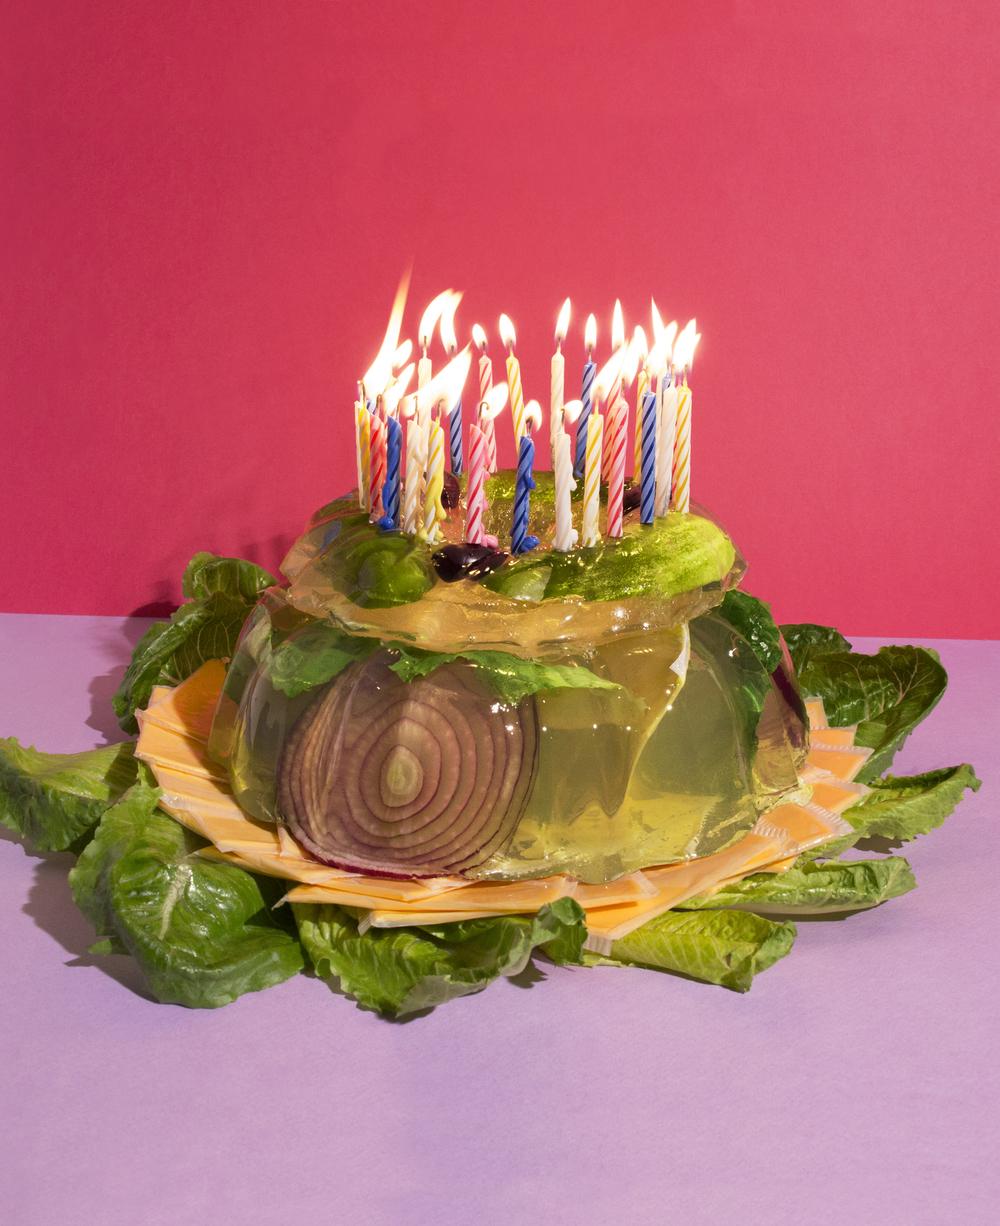 LAZY MOM_luckypeach-05-birthday cake.jpg